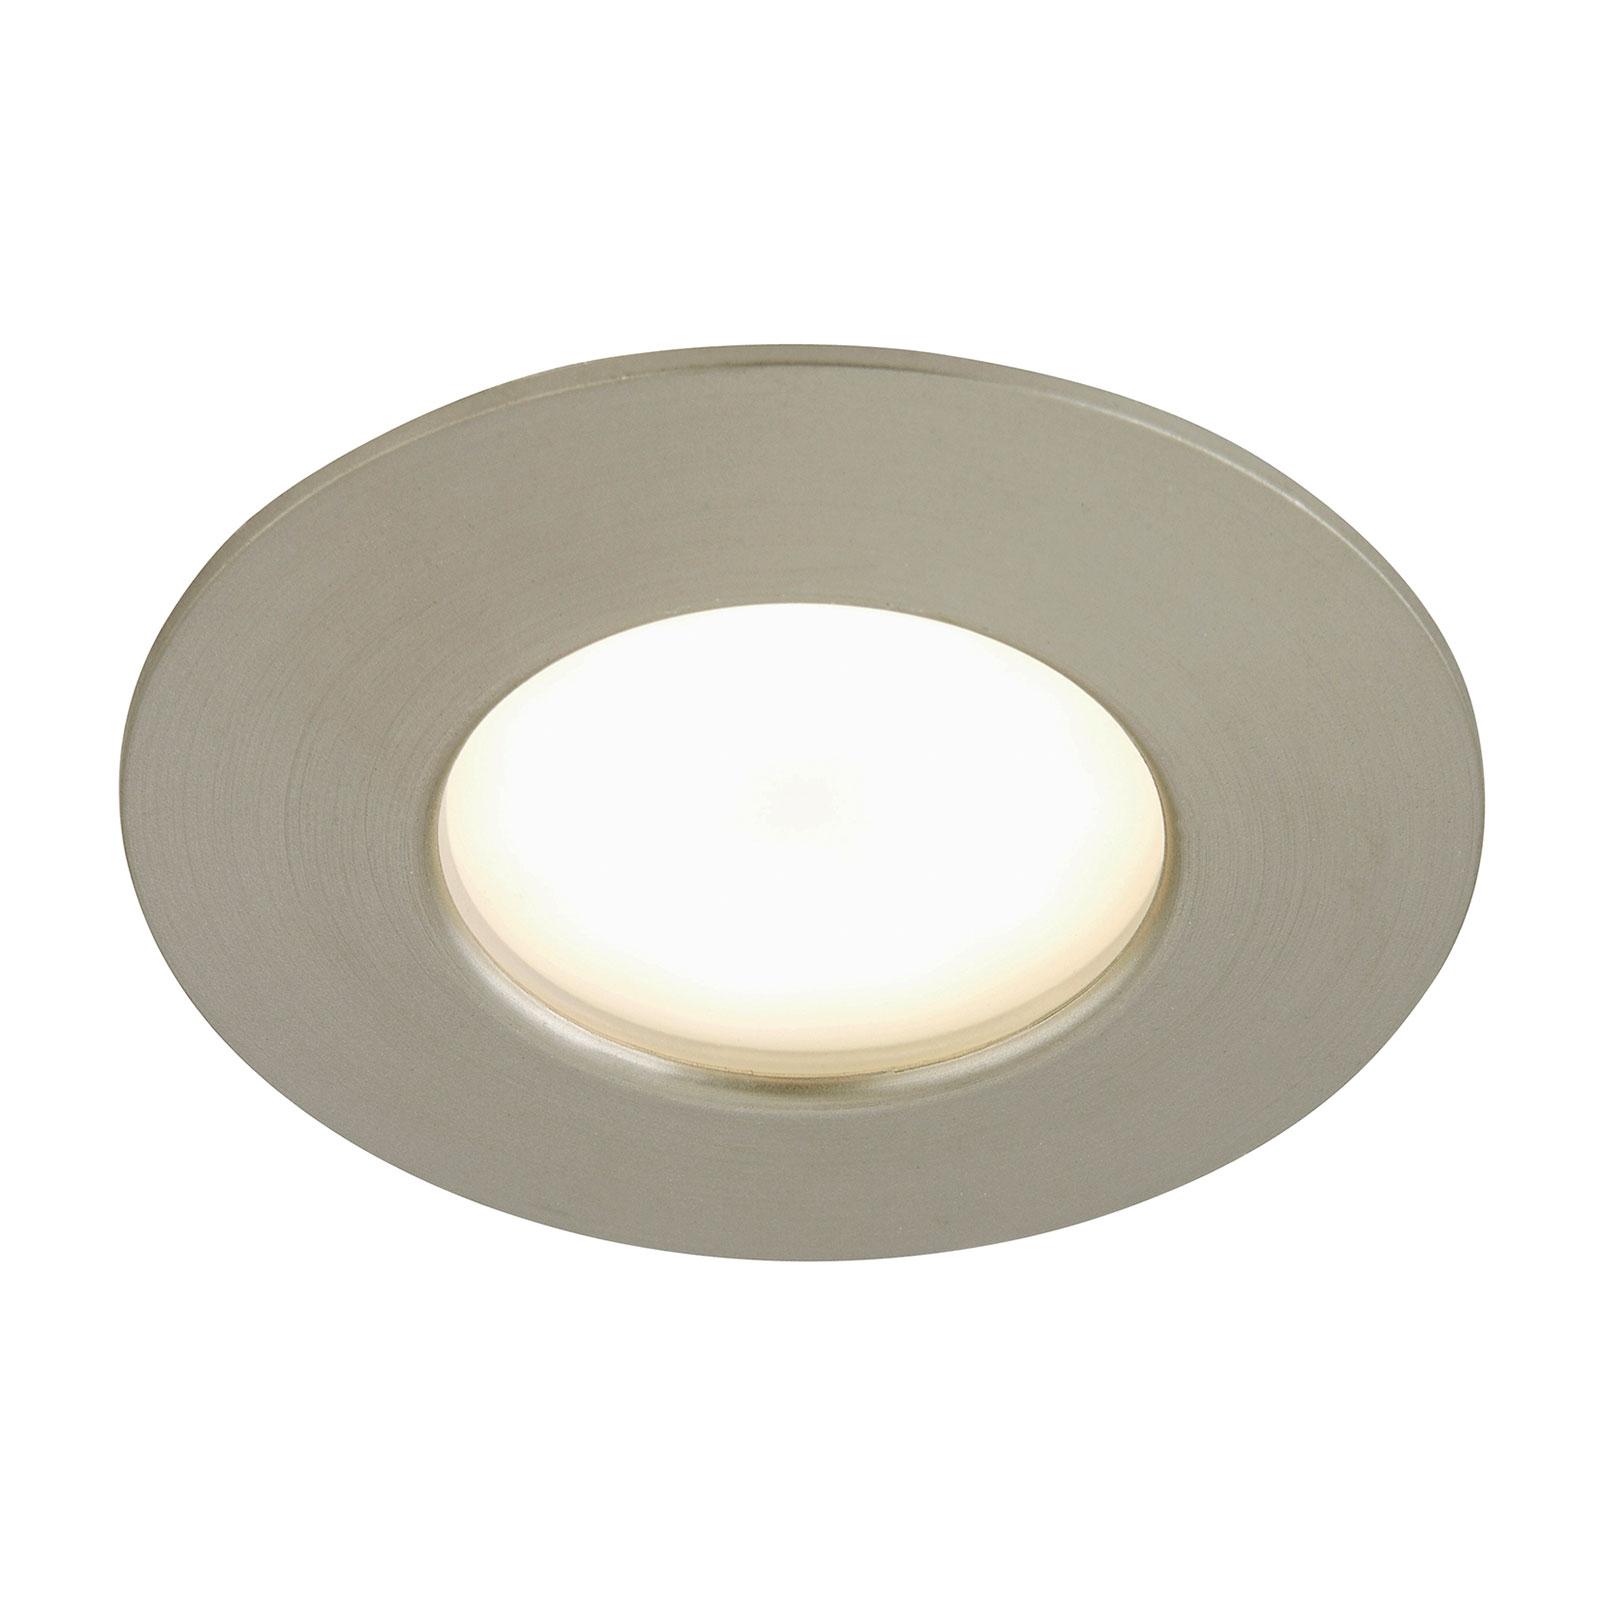 Felia - LED podhledové svítidlo IP44 nikl matný